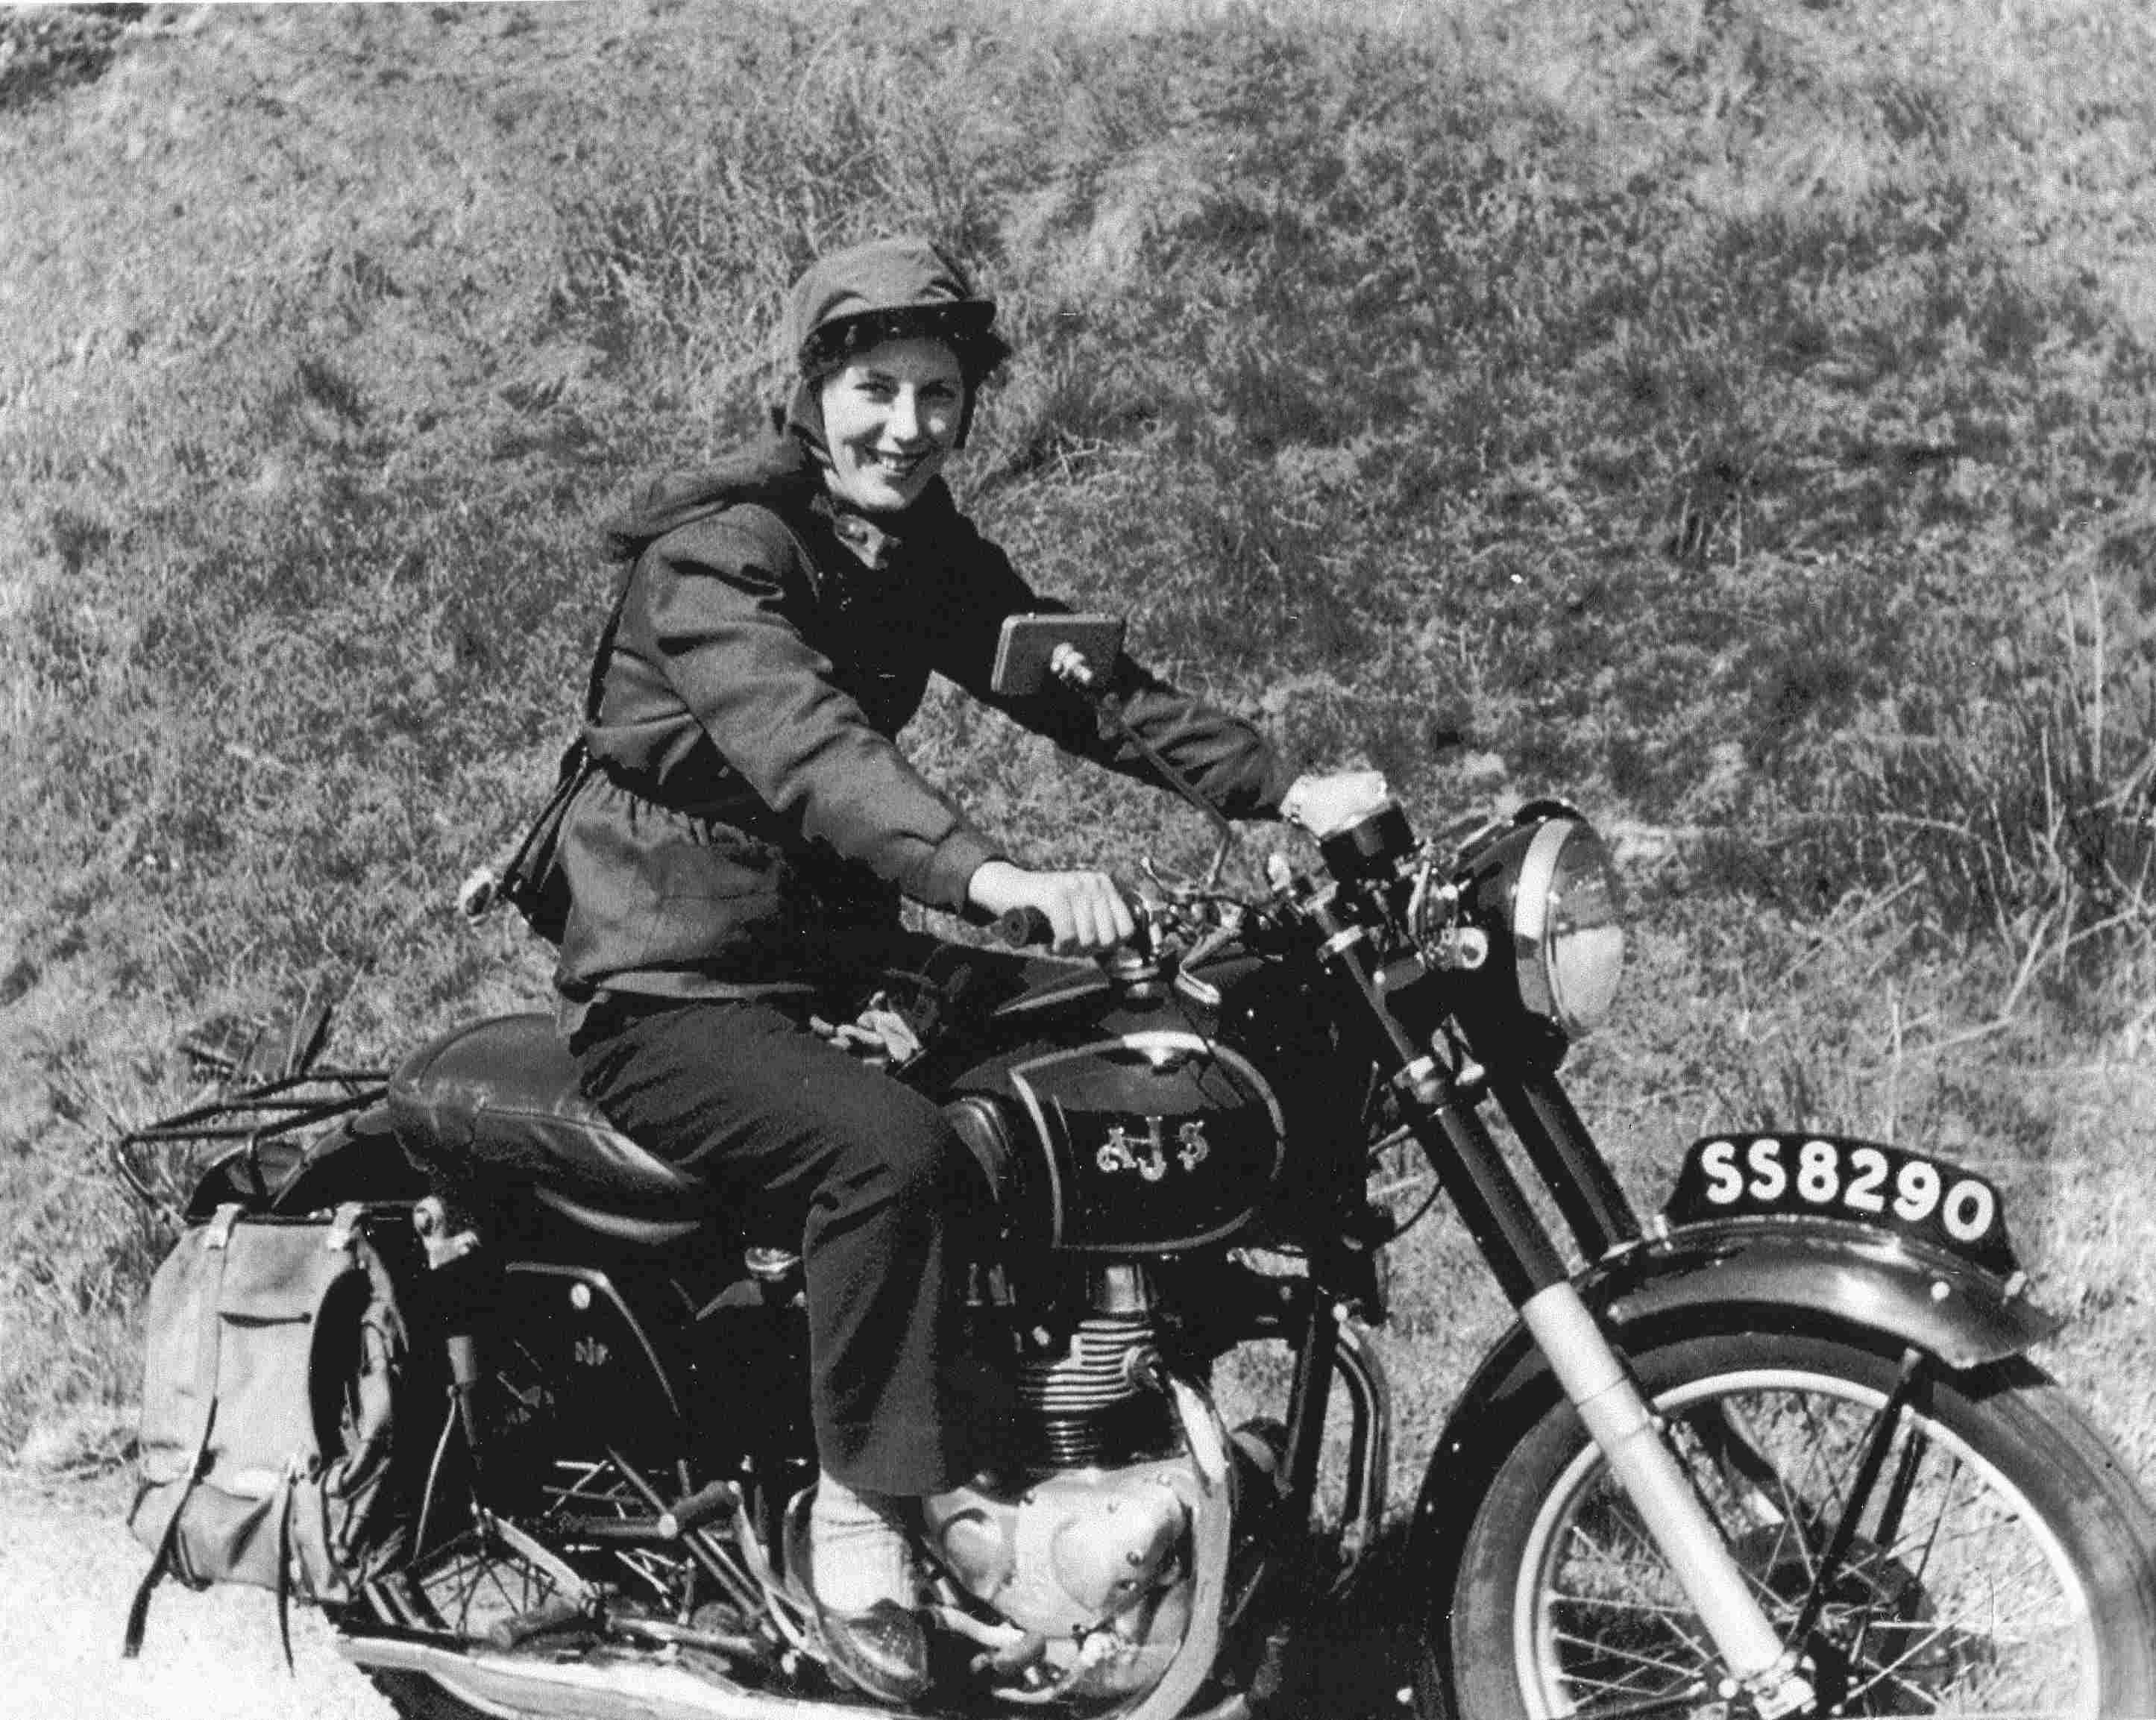 Woman Riding Motorbike 1960s